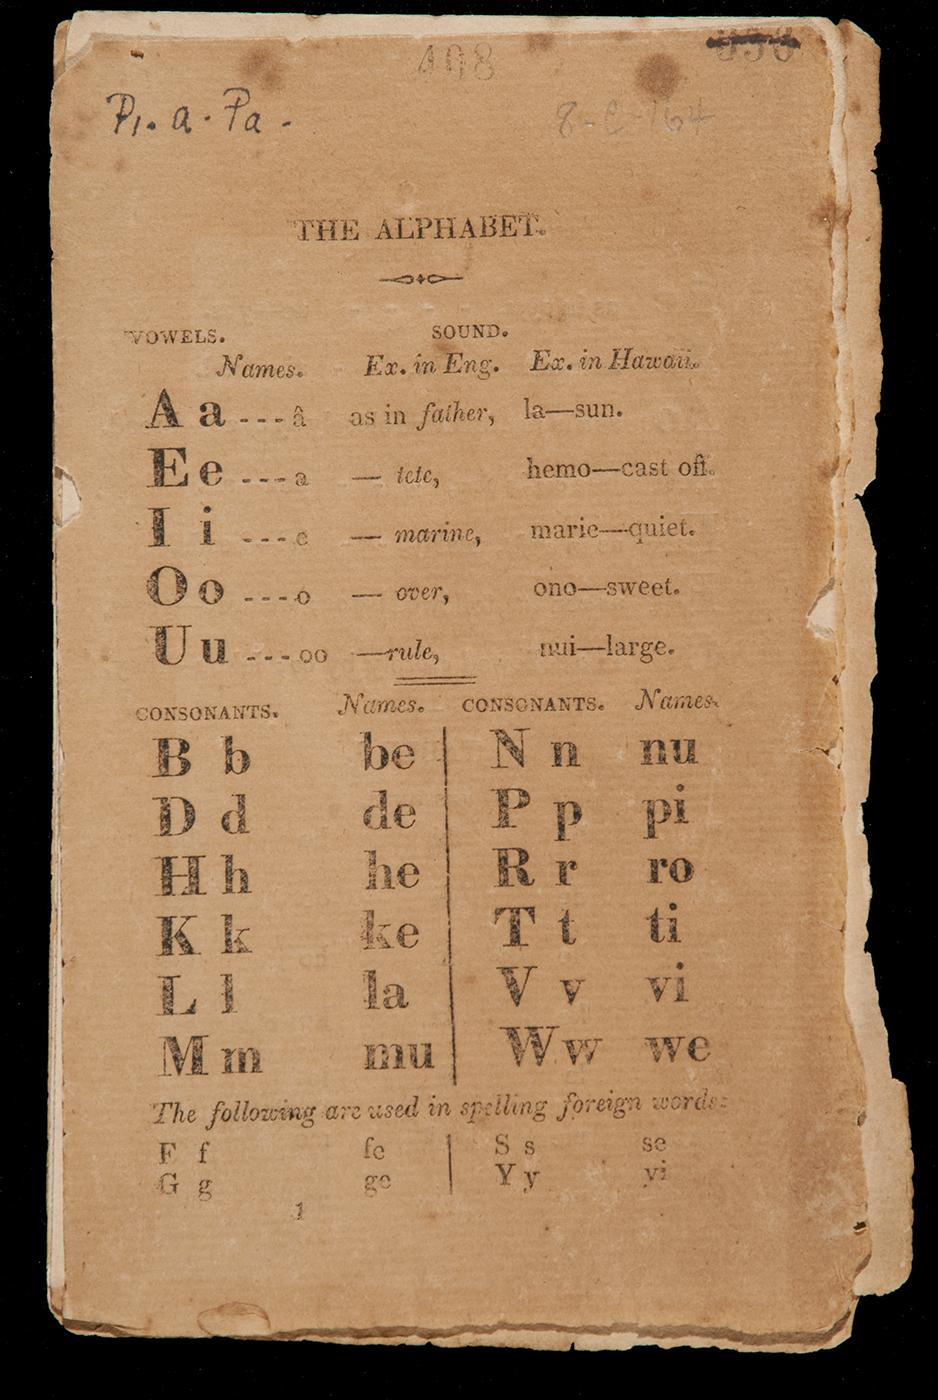 [The Alphabet] Spelling book. Photo by David Franzen.